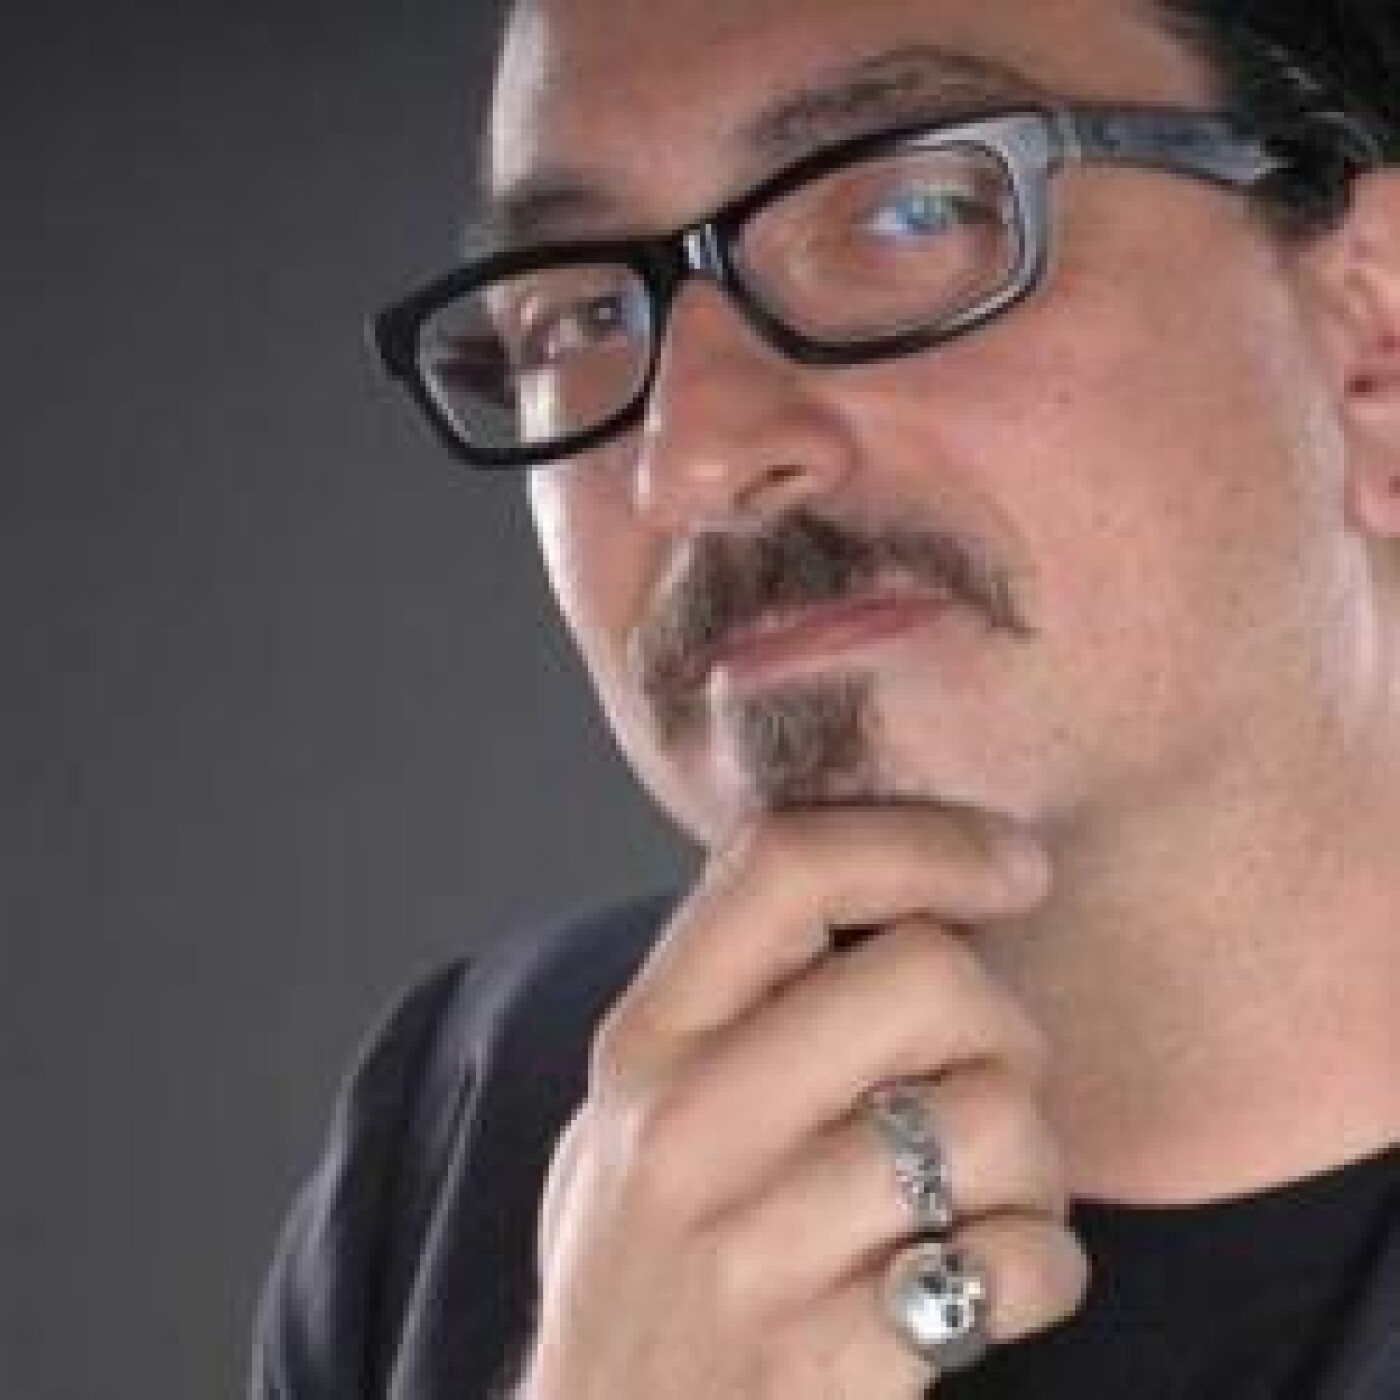 Music News de La Matinale FG : 'Love Hangover' d'Eric Kupper